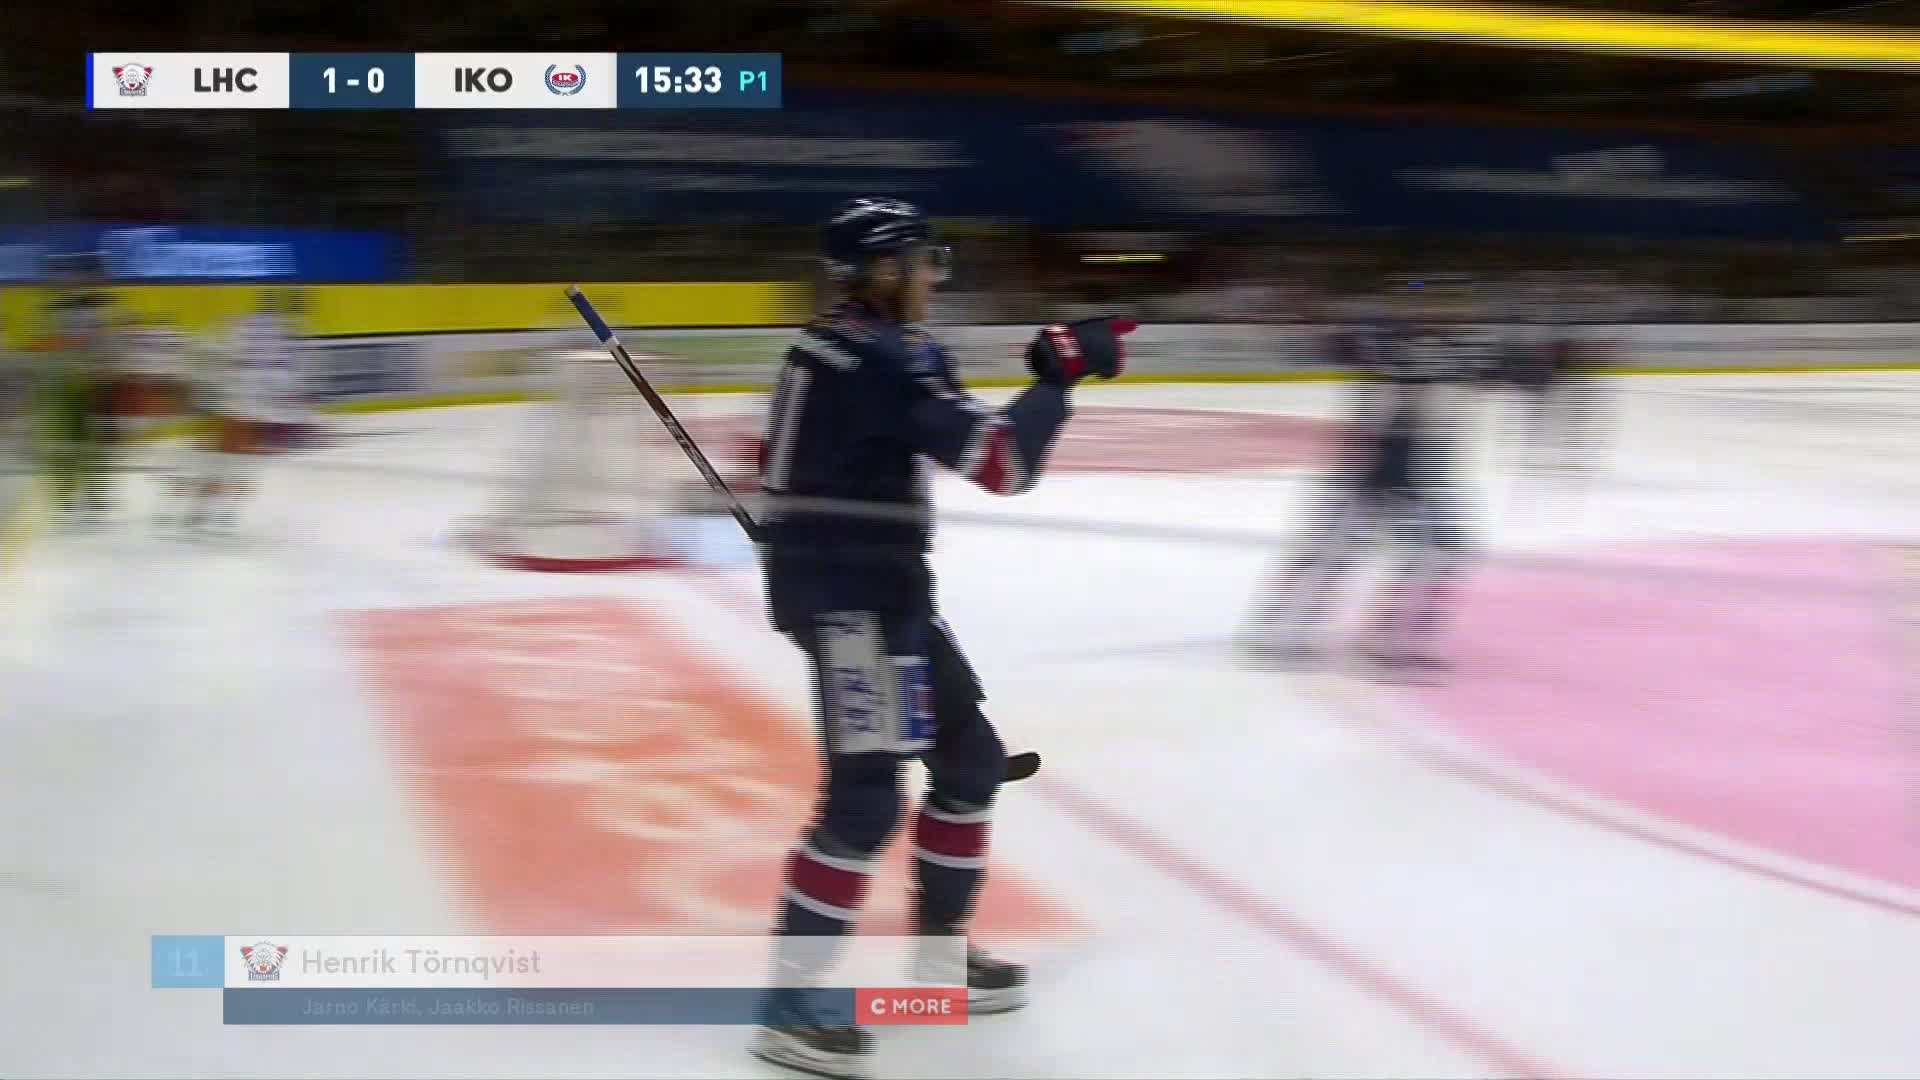 Linköping HC - IK Oskarshamn 1-0